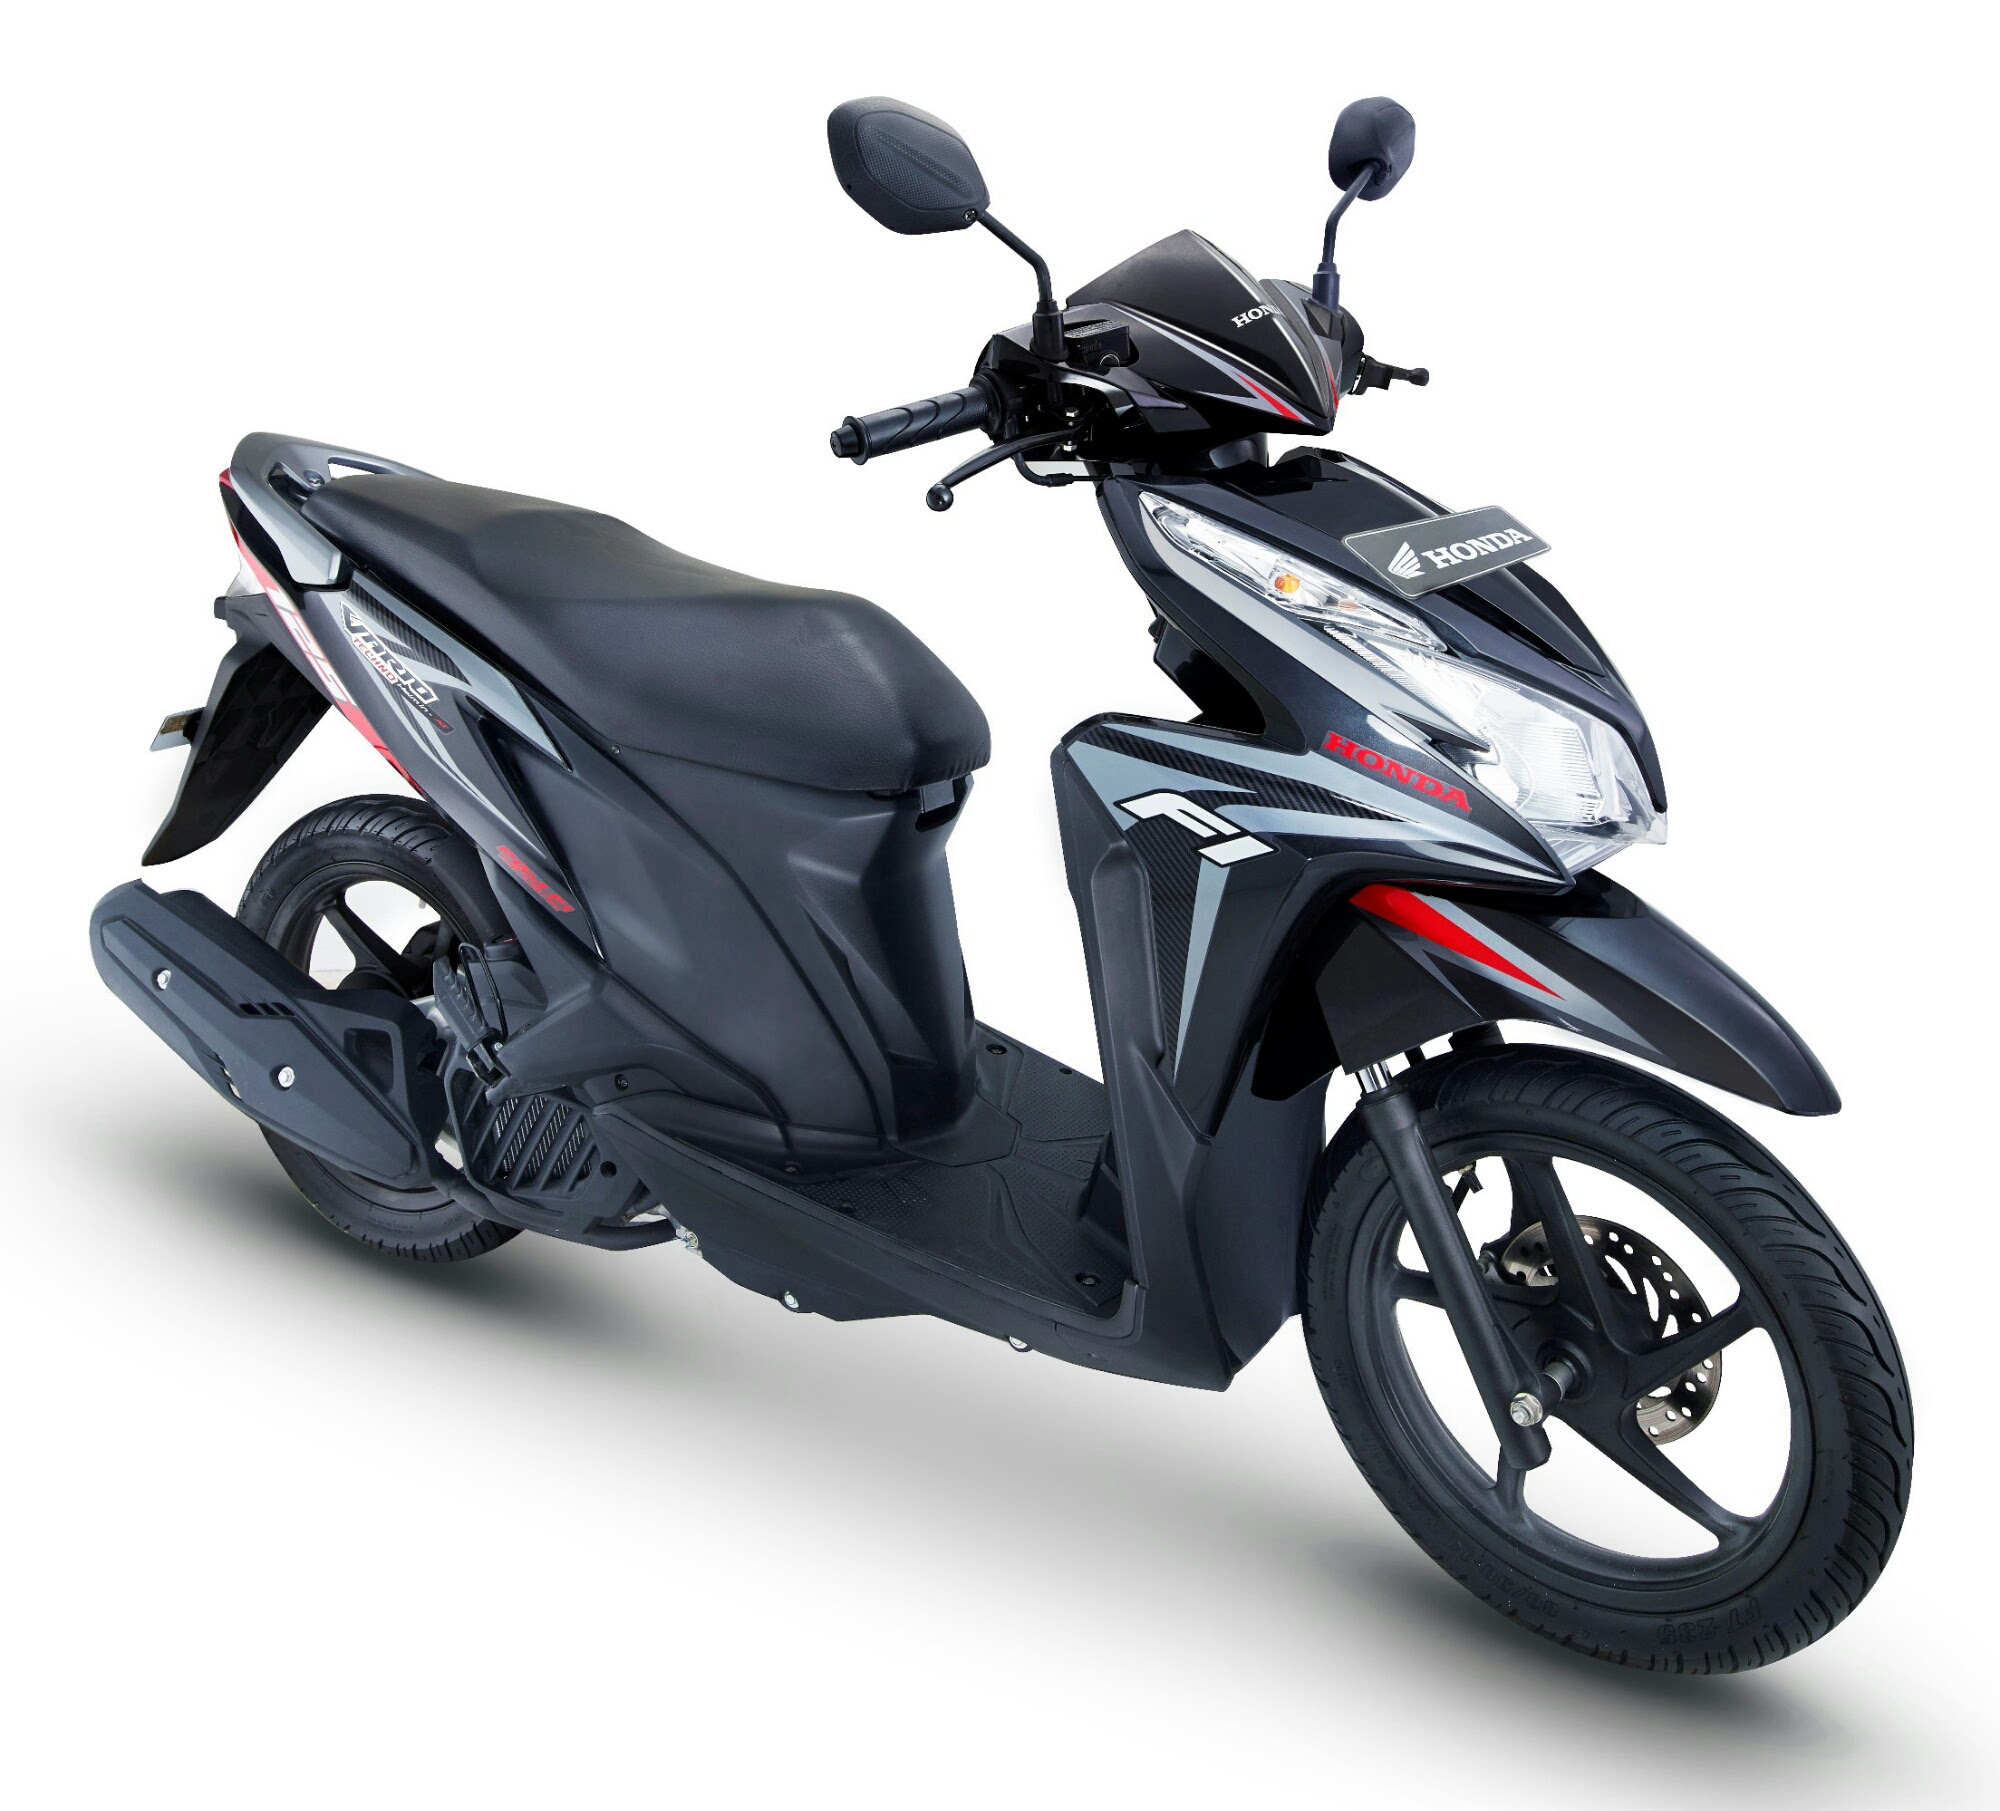 Bengkel Modifikasi Vario 125 Bandung Galeri Motor Vario